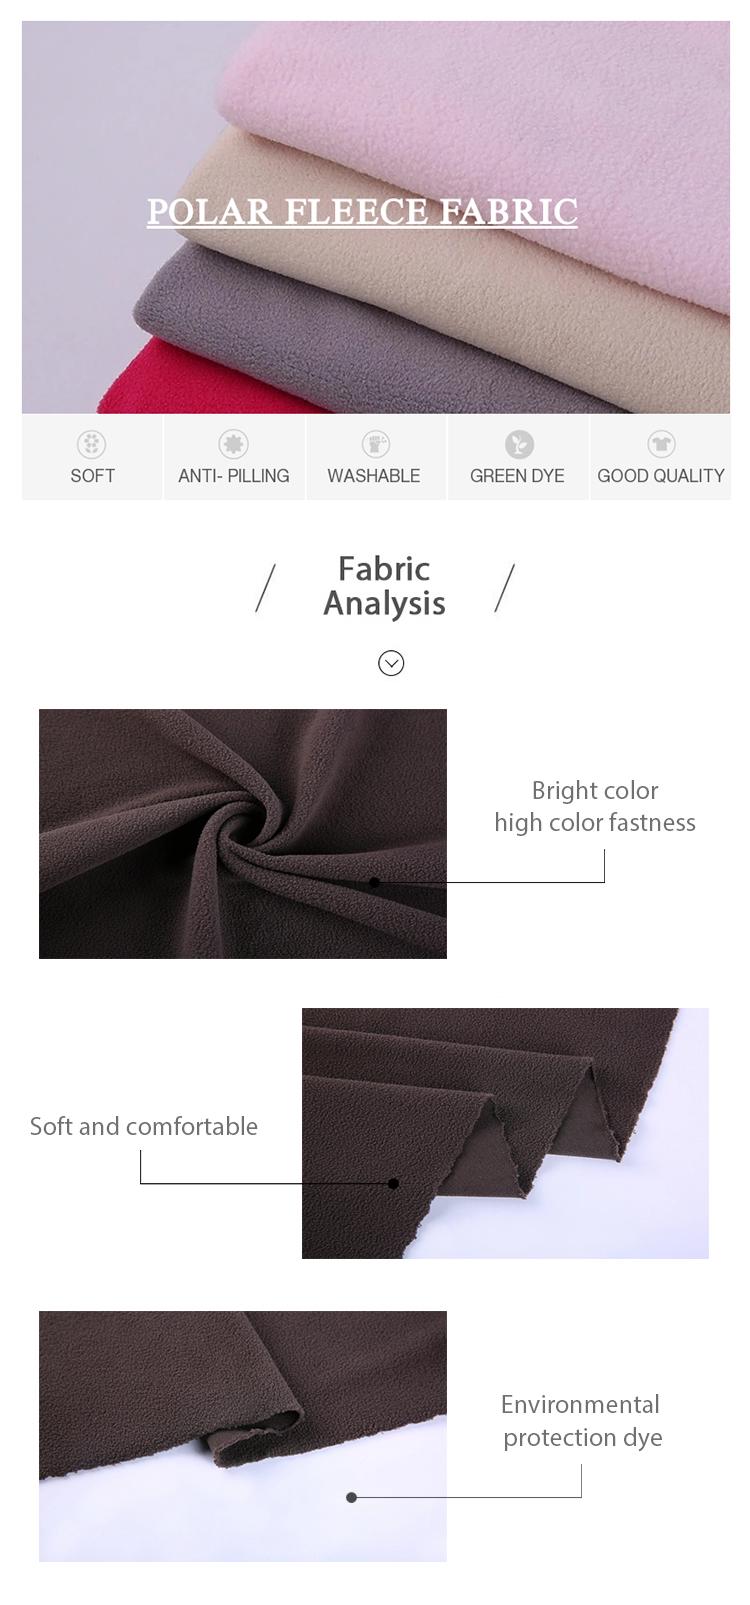 Kleding stoffen gratis monster textiel polar fleece stof 100% polyester turkije